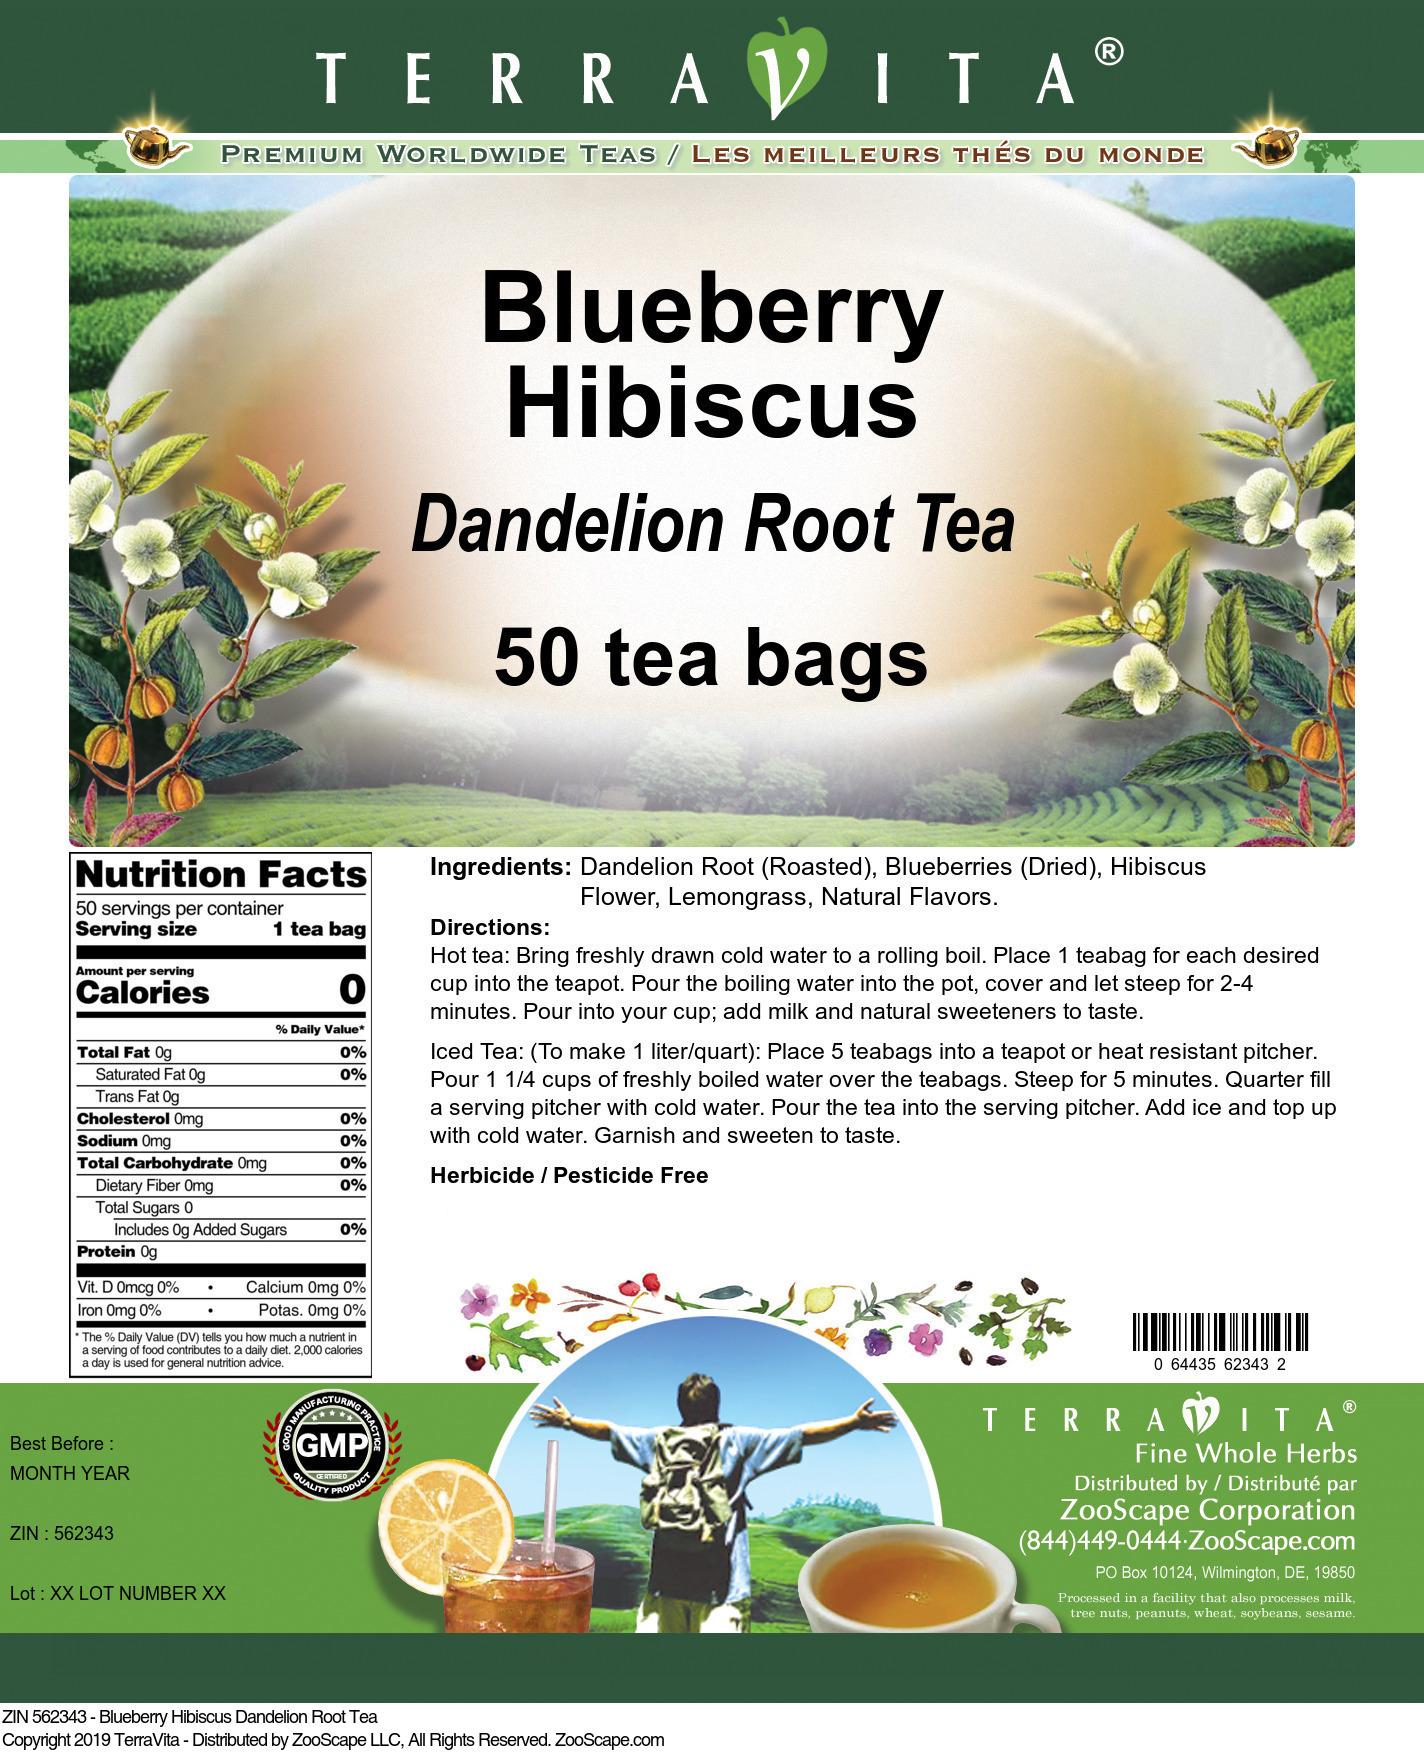 Blueberry Hibiscus Dandelion Root Tea